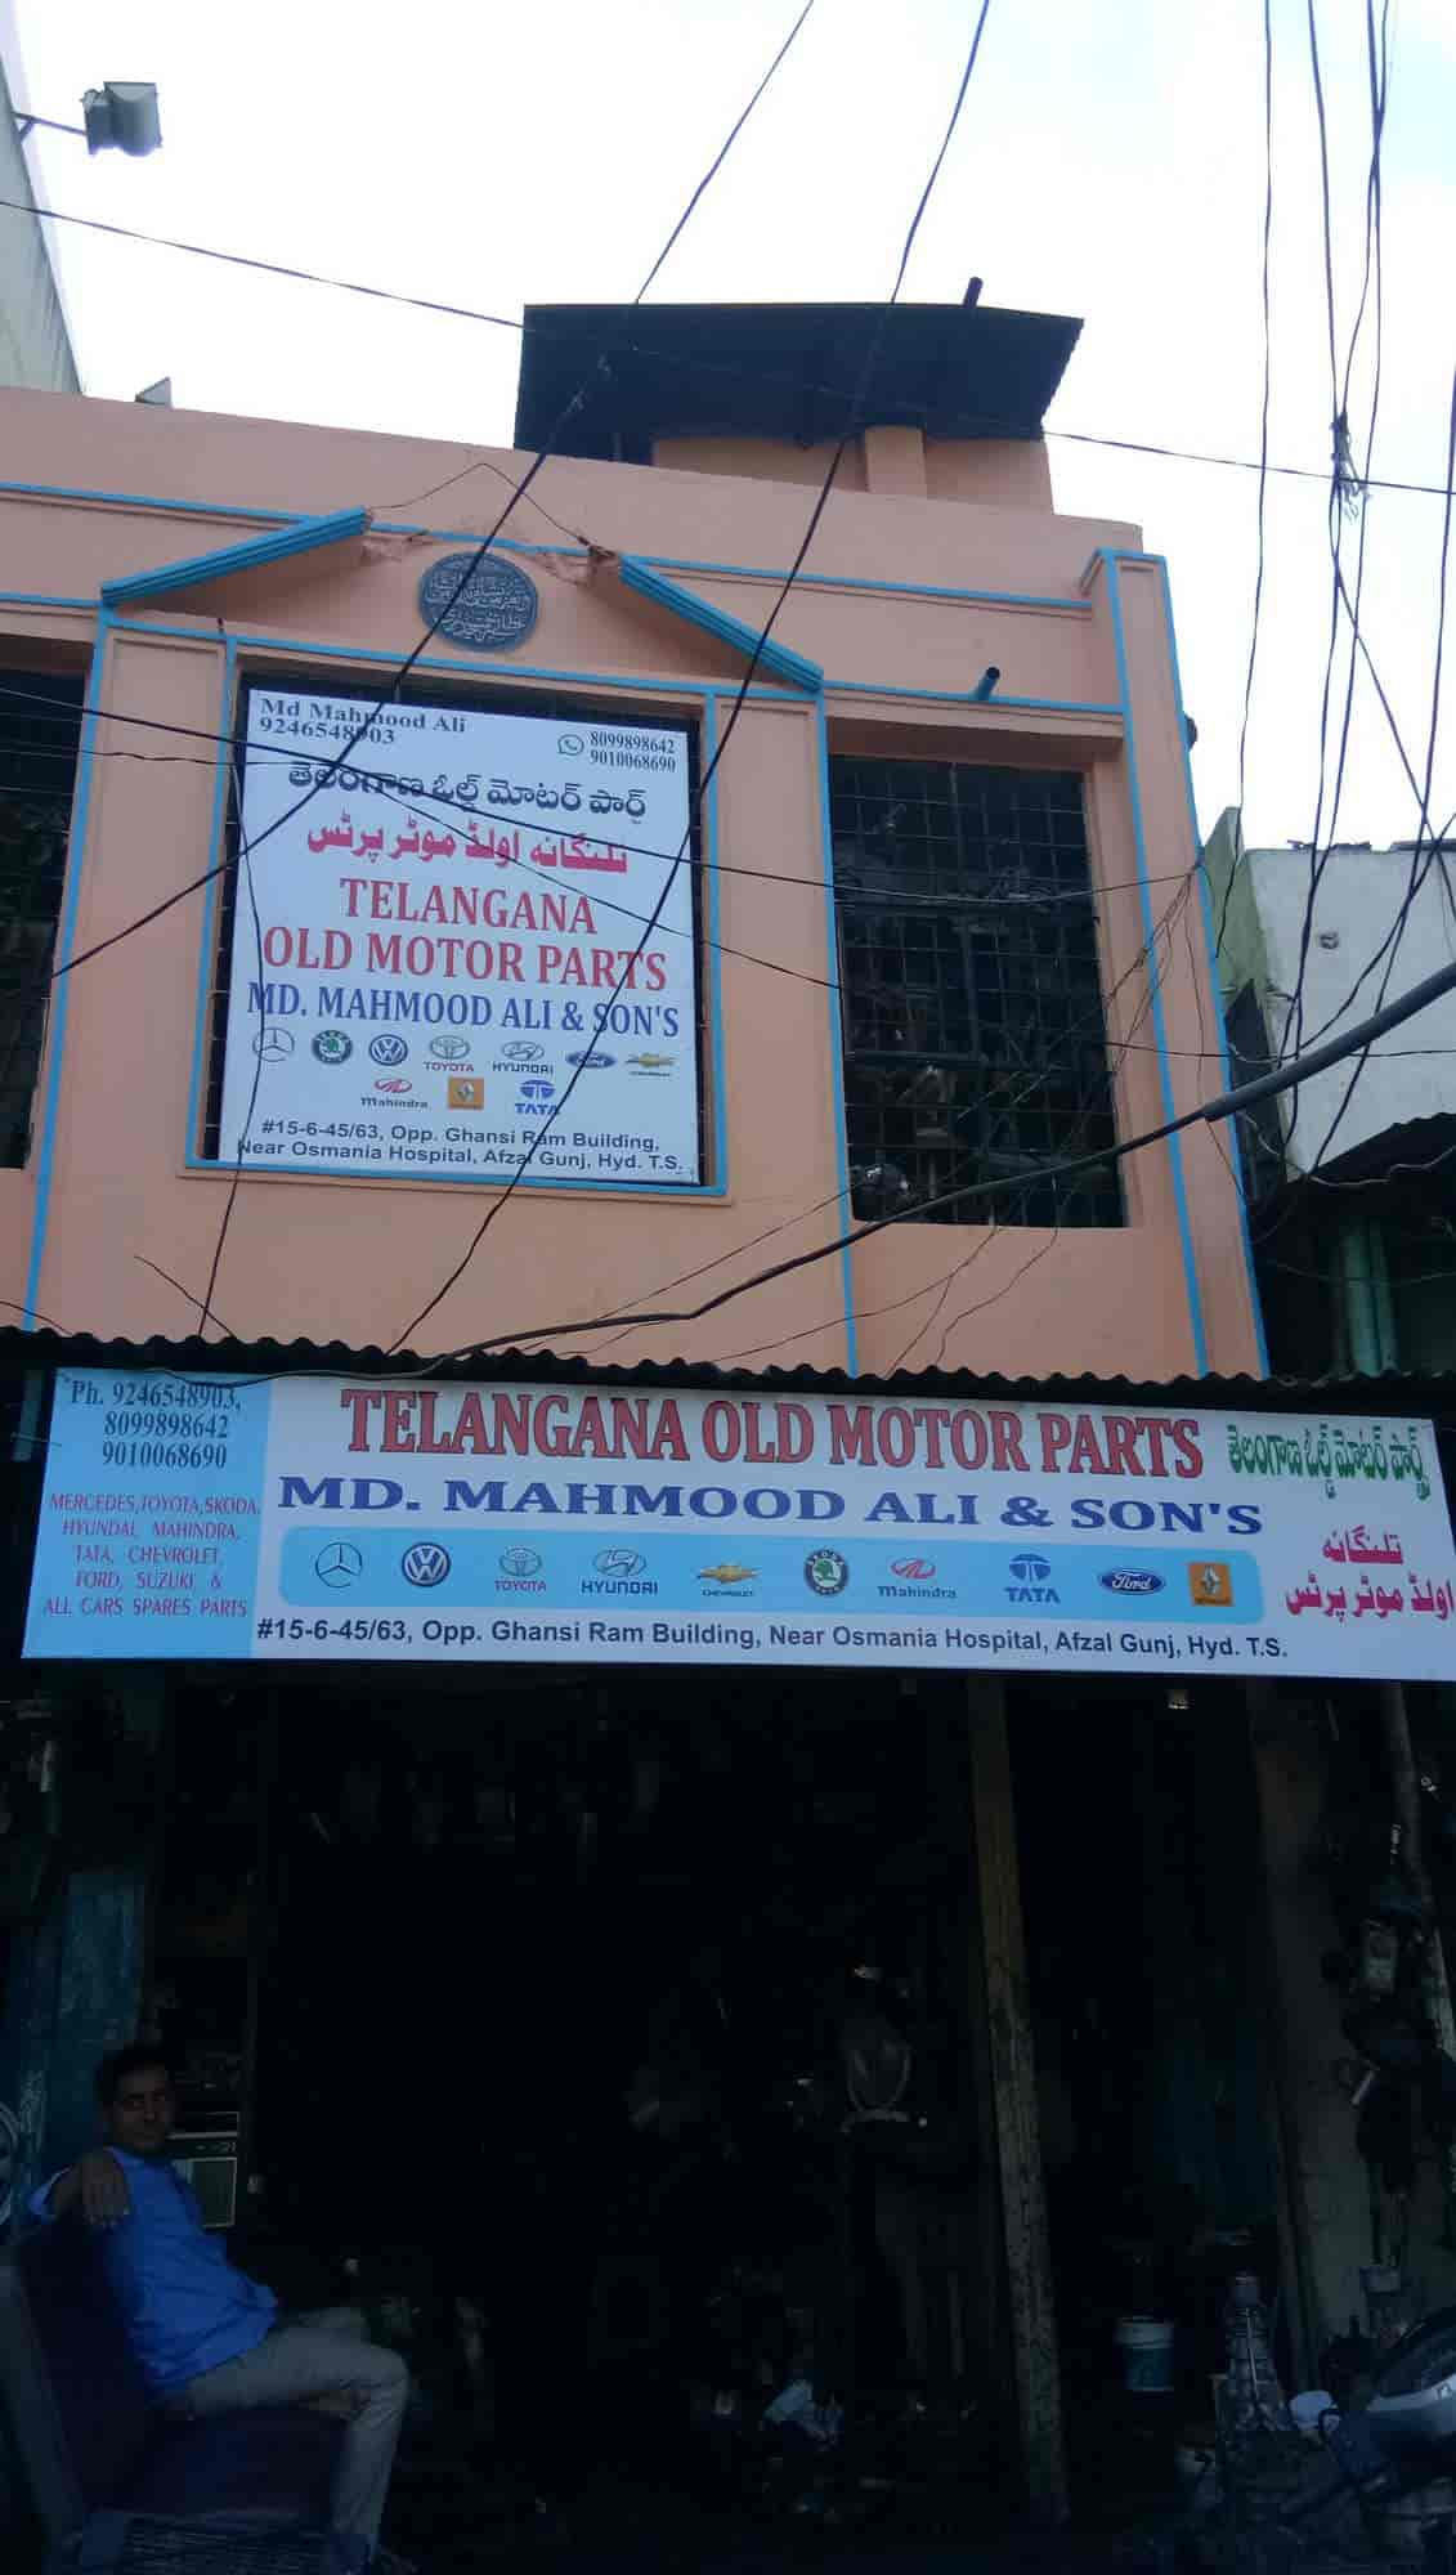 Telangana Old Motor Parts Photos, Afzal Gunj, Hyderabad- Pictures